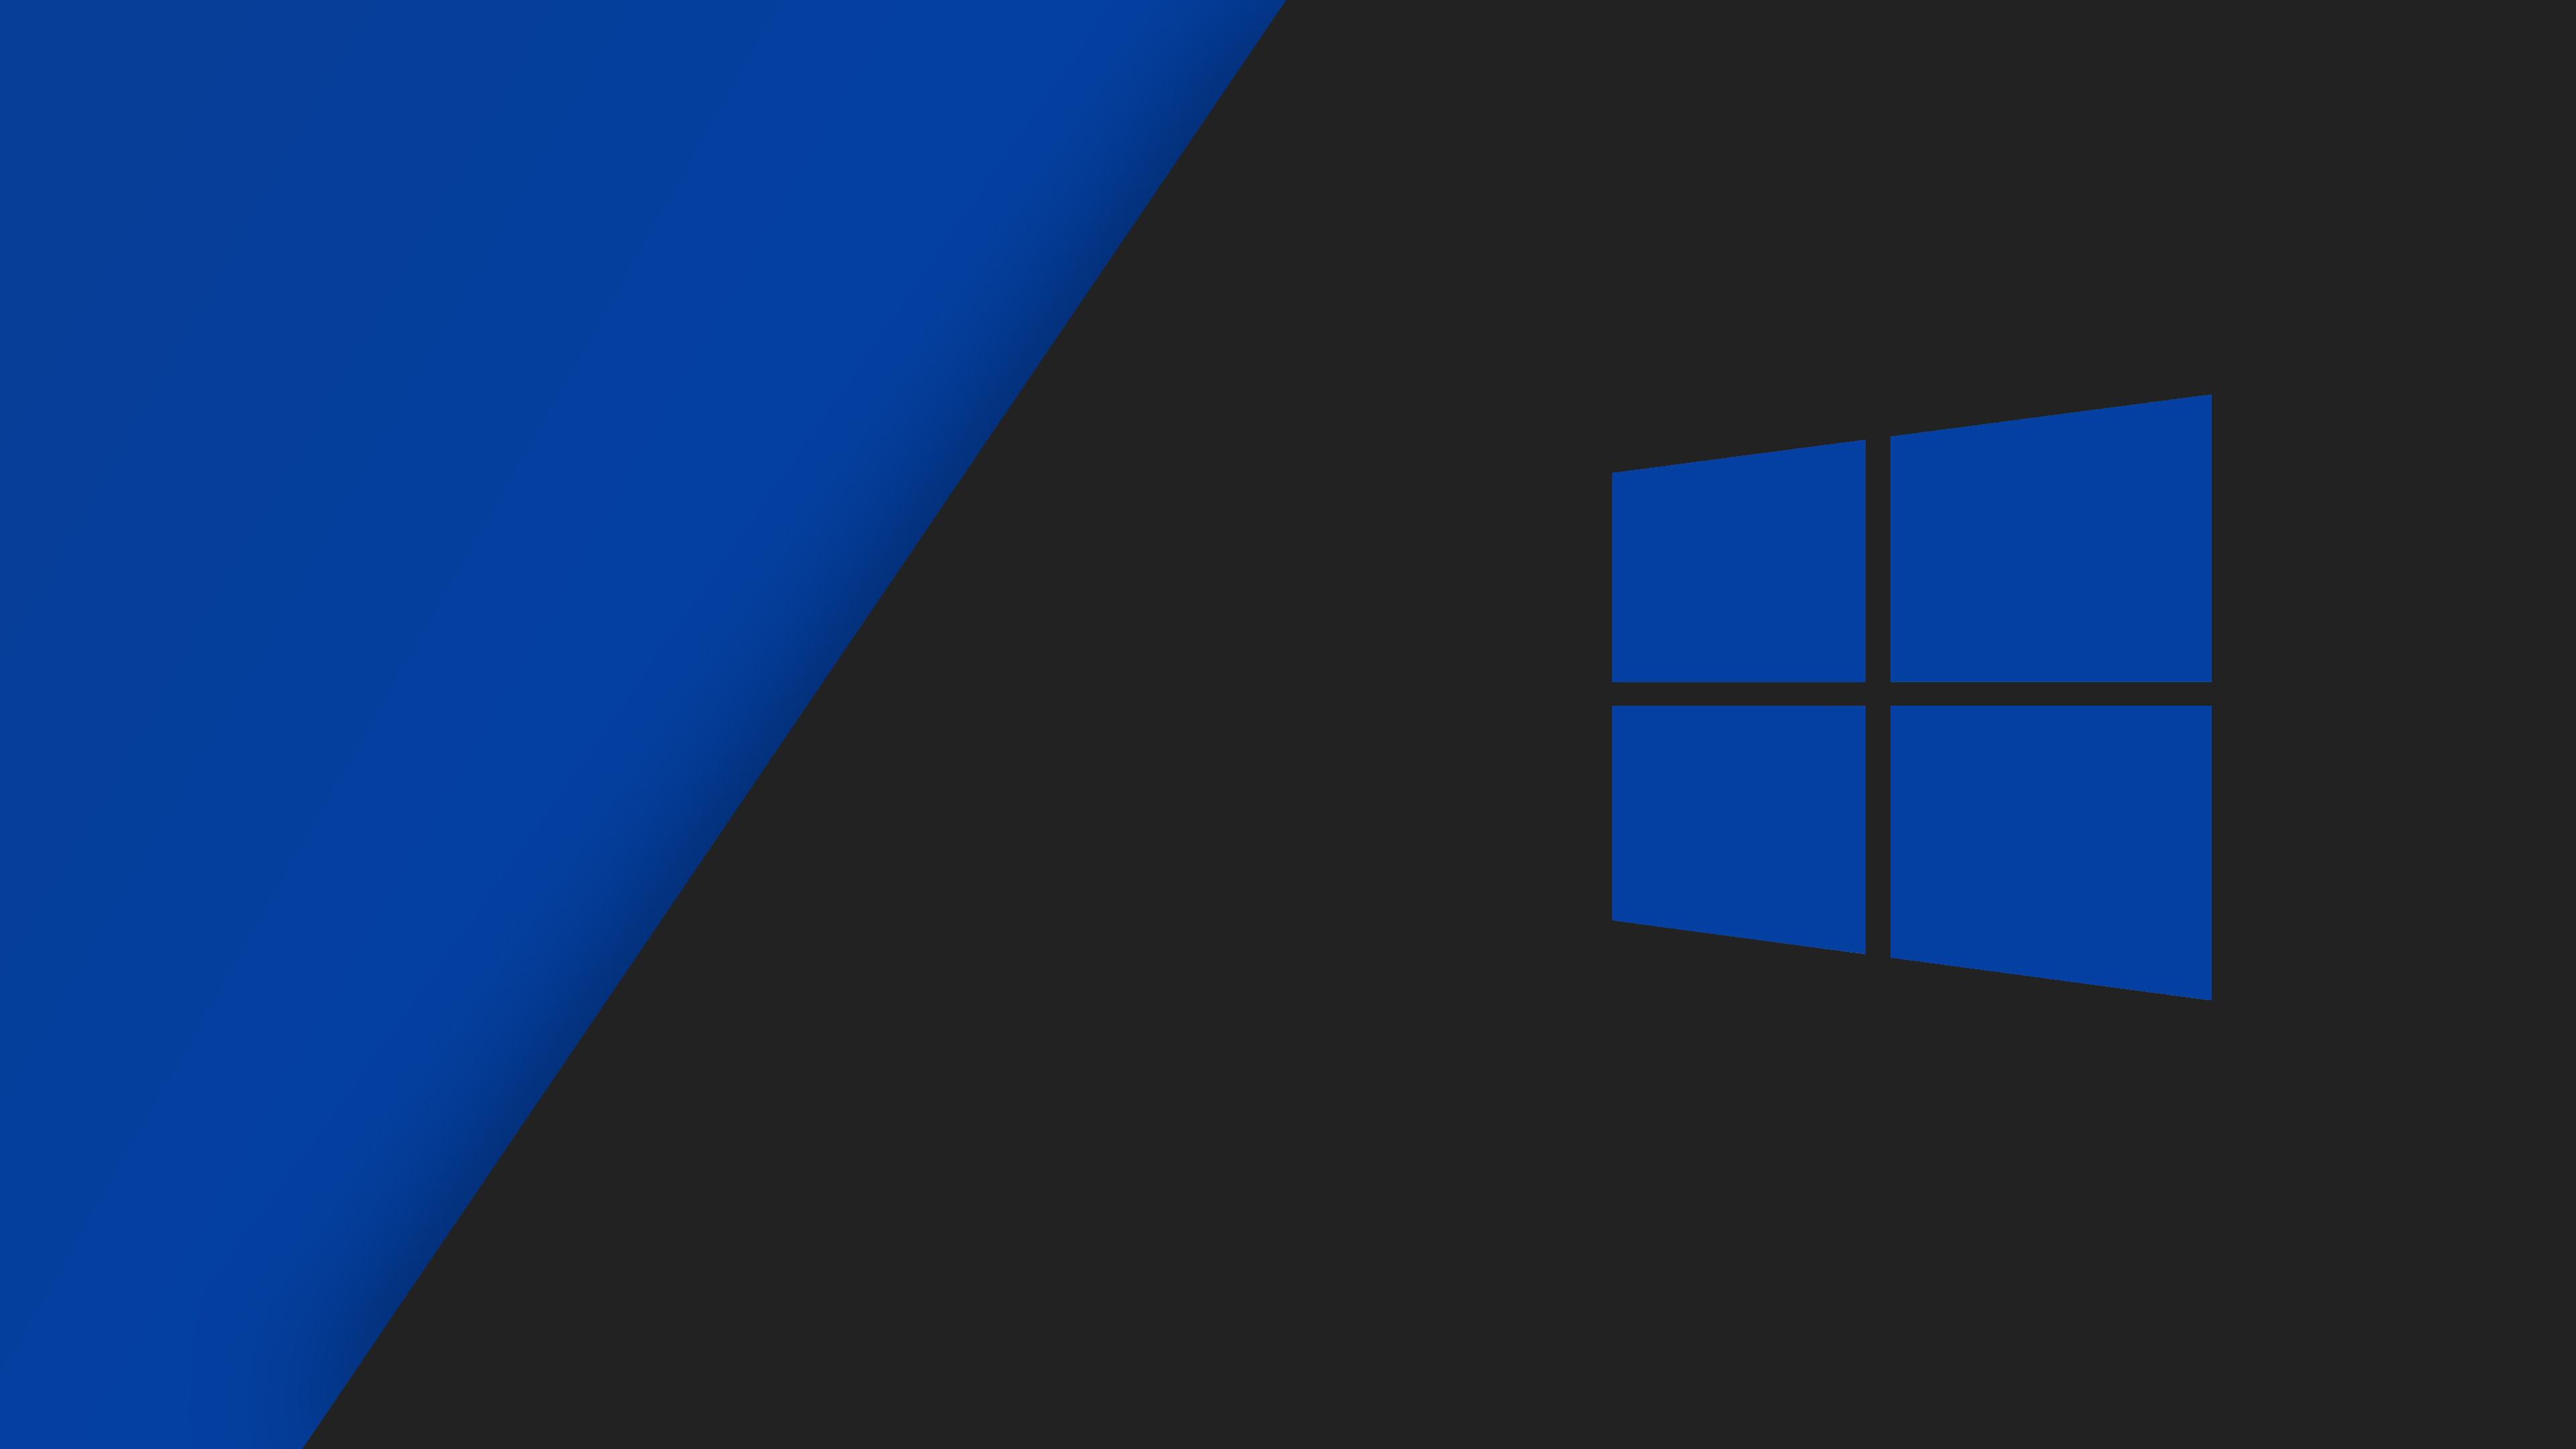 Windows 10 Pro Wallpaper 79 Images